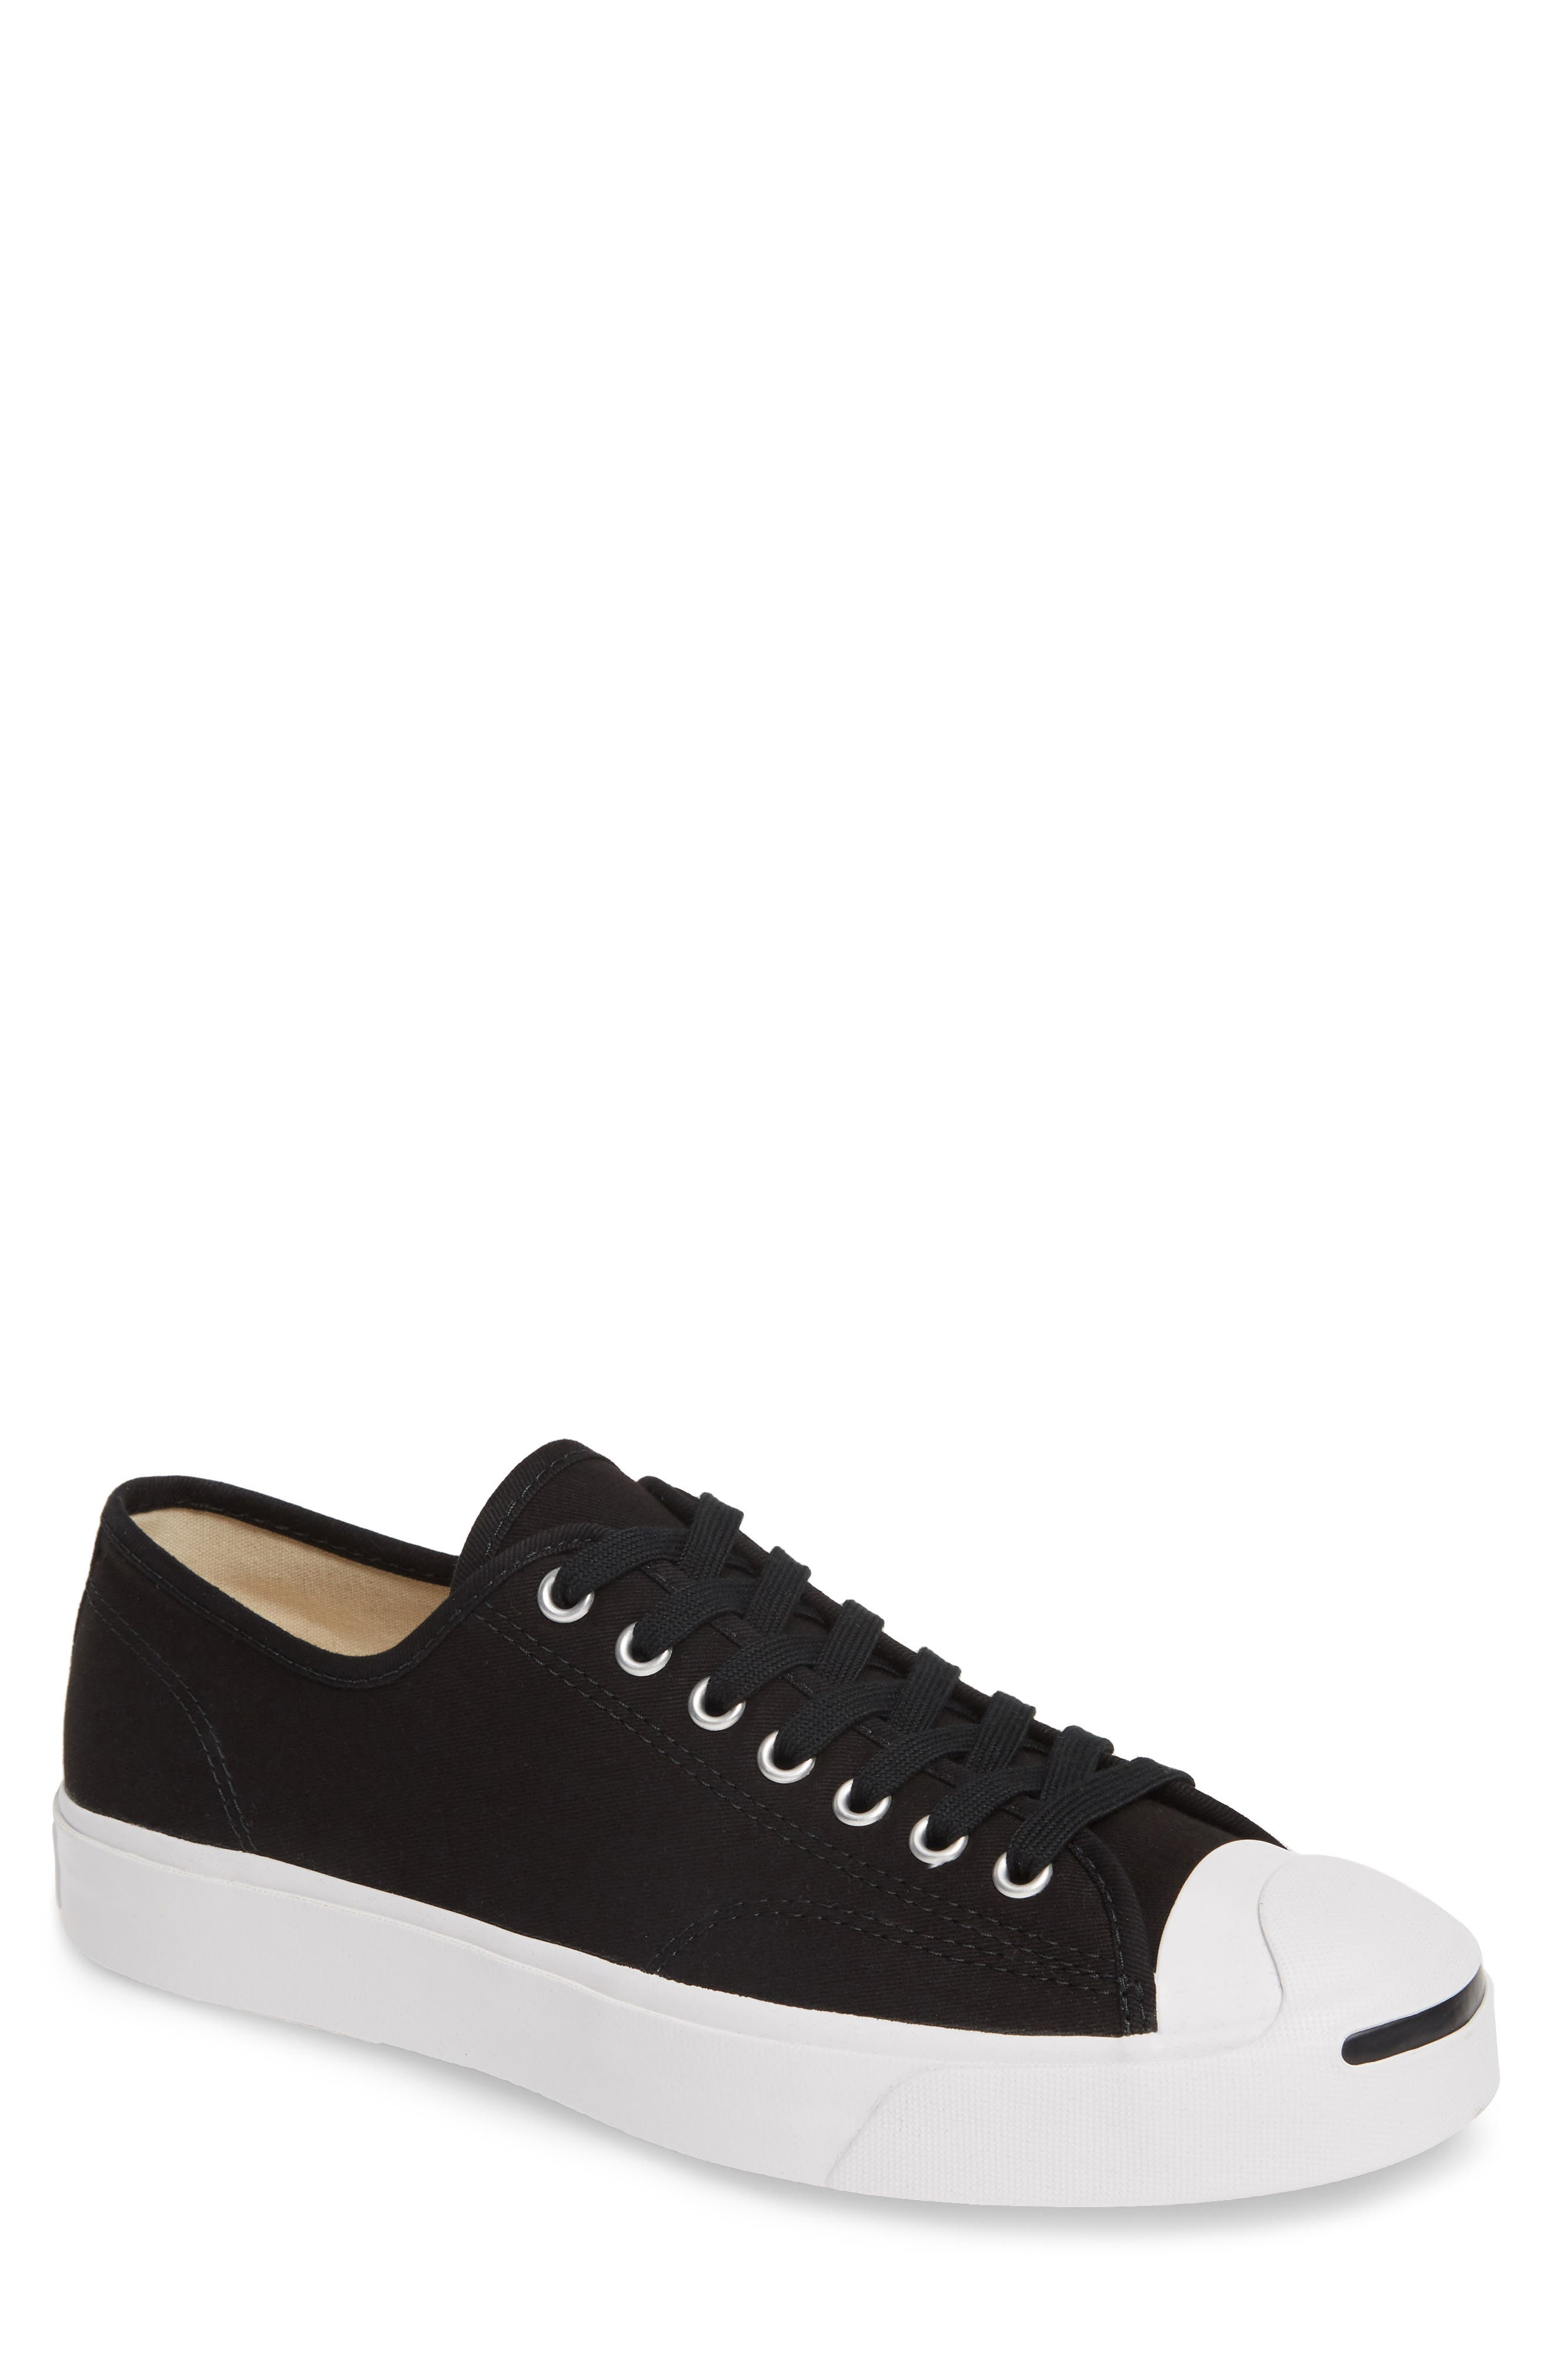 Converse Jack Purcell Sneaker (Men